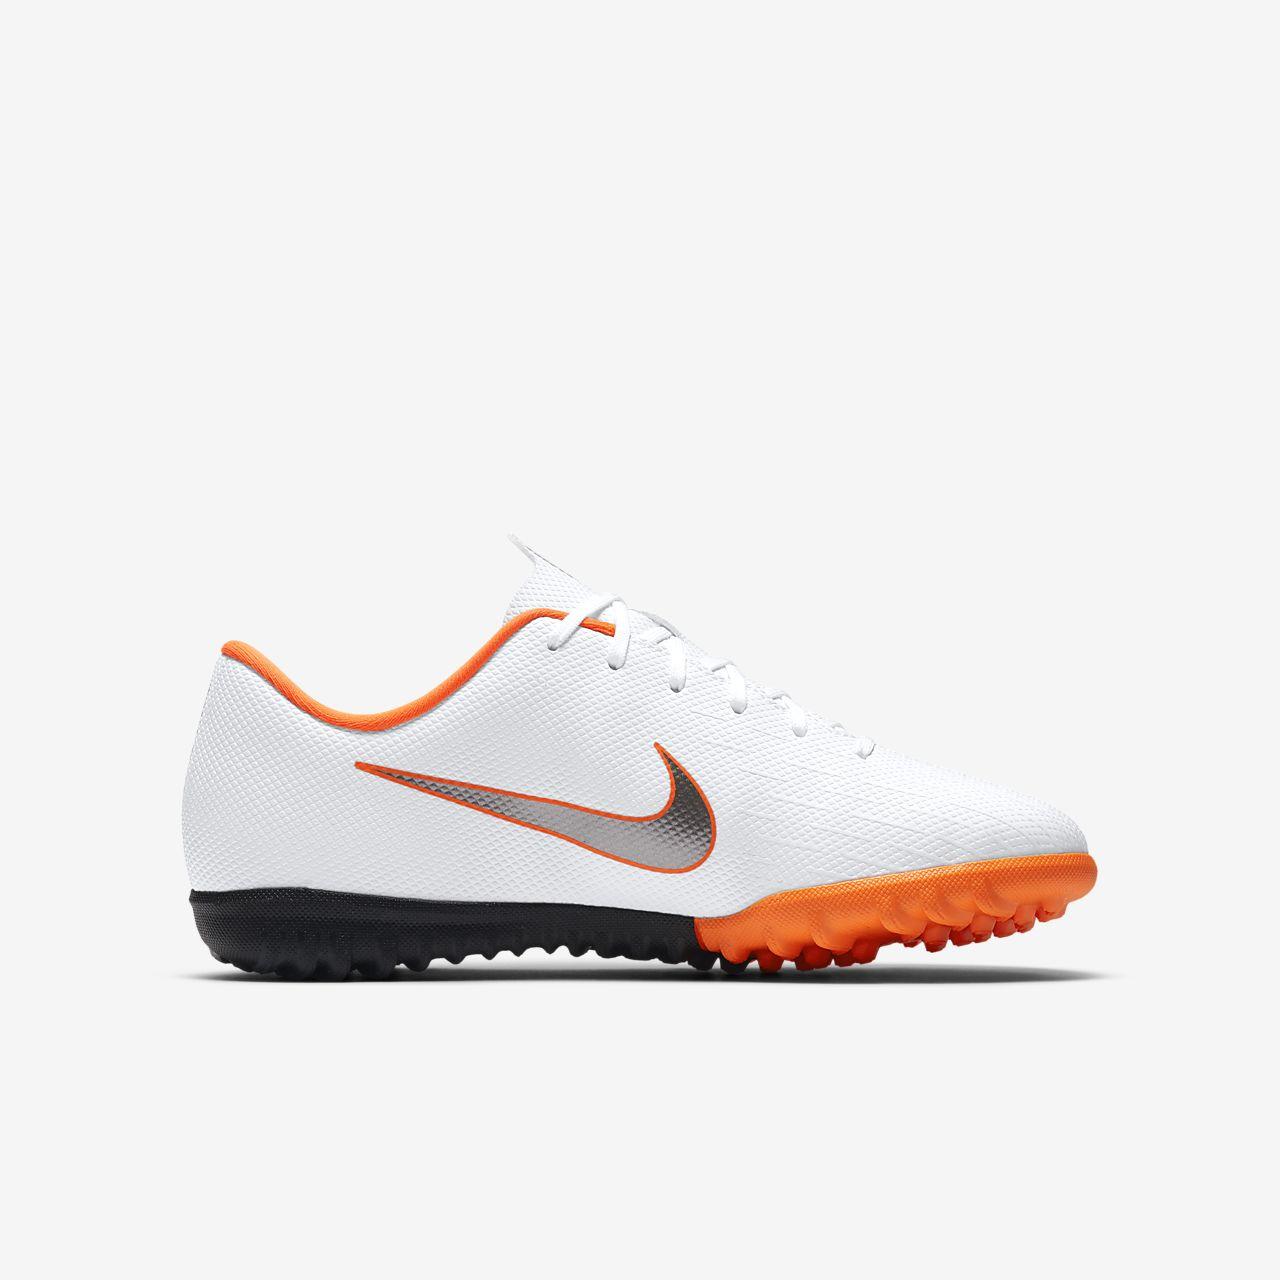 Xii Sintetica Da Vapor Mercurialx Scarpa Calcio Per Erba Nike Jr qpcqzIwdF